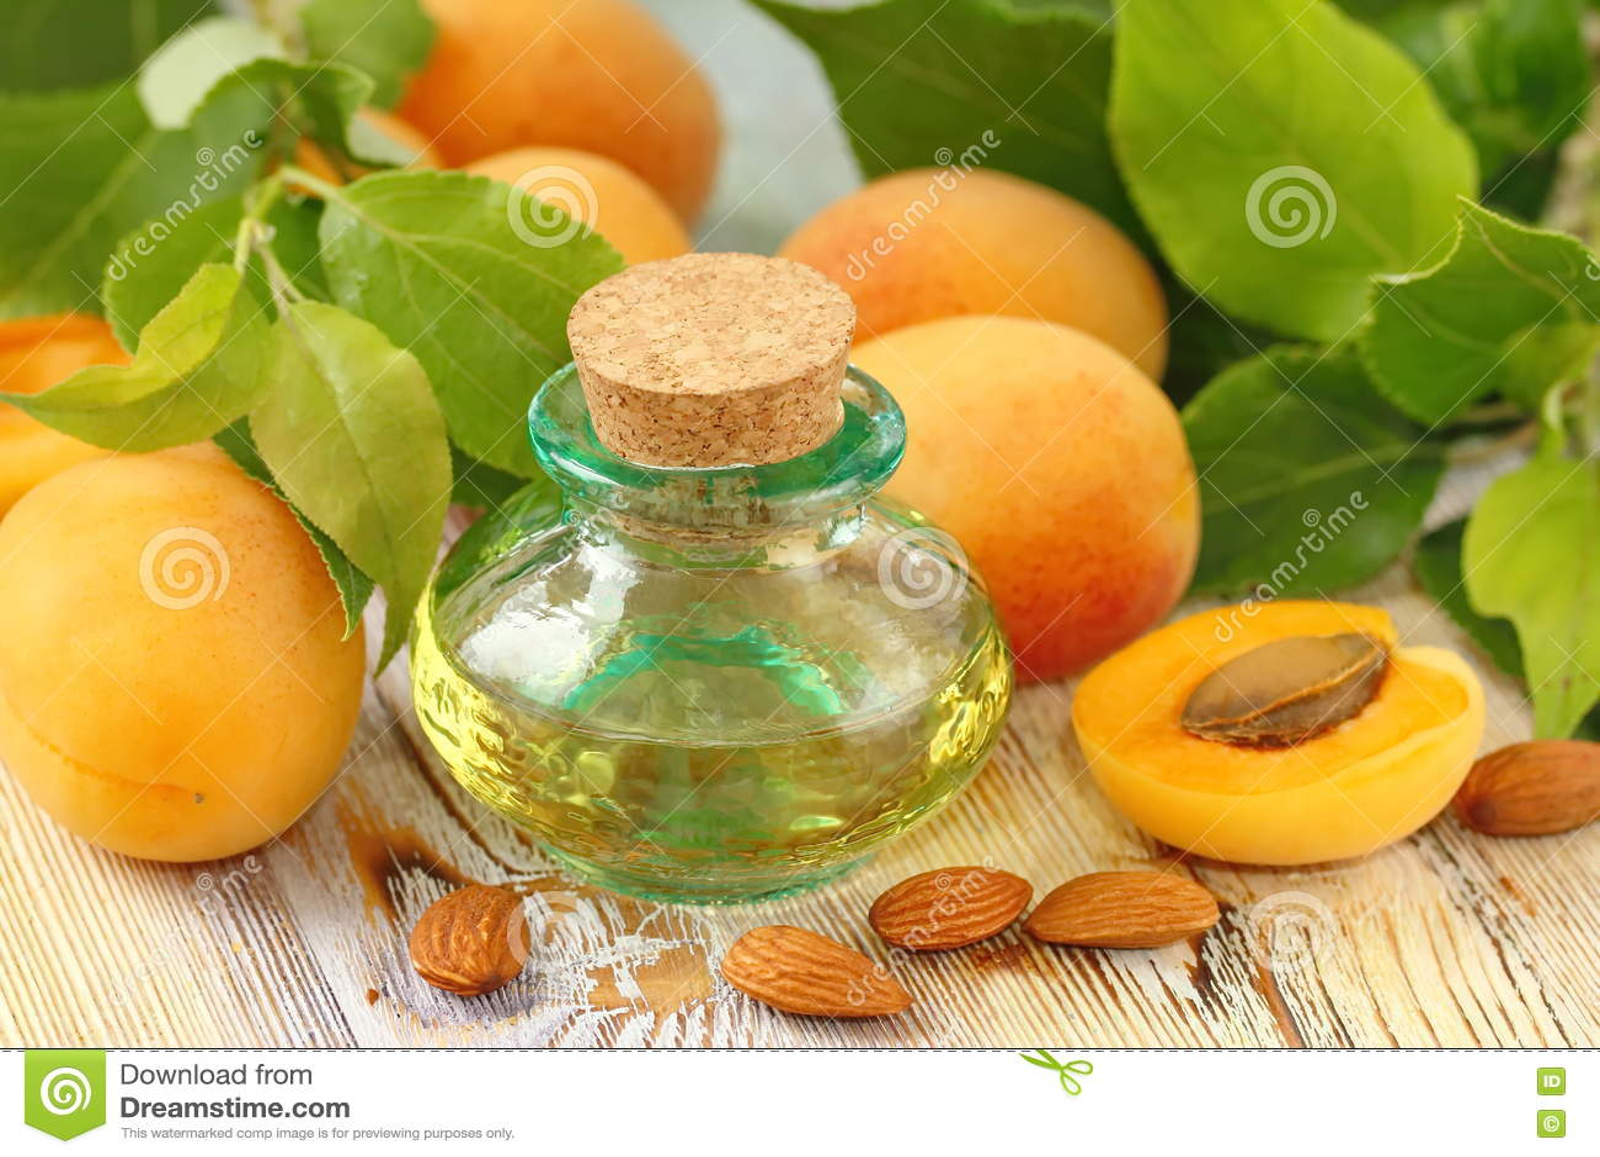 Apricot aroma oil